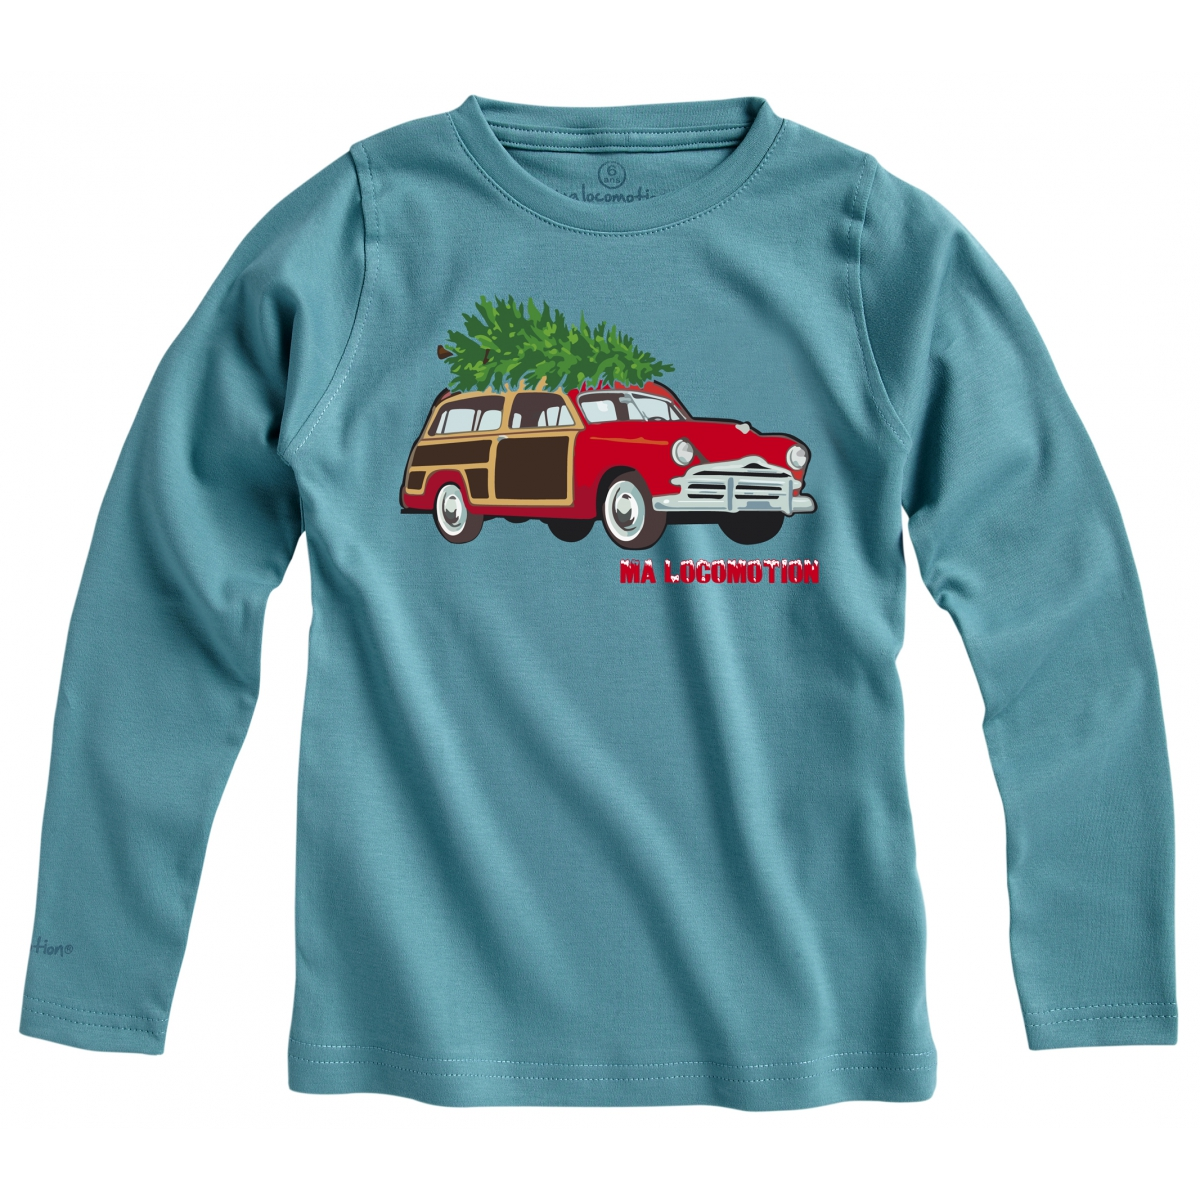 Vintage Christmas car - green blue